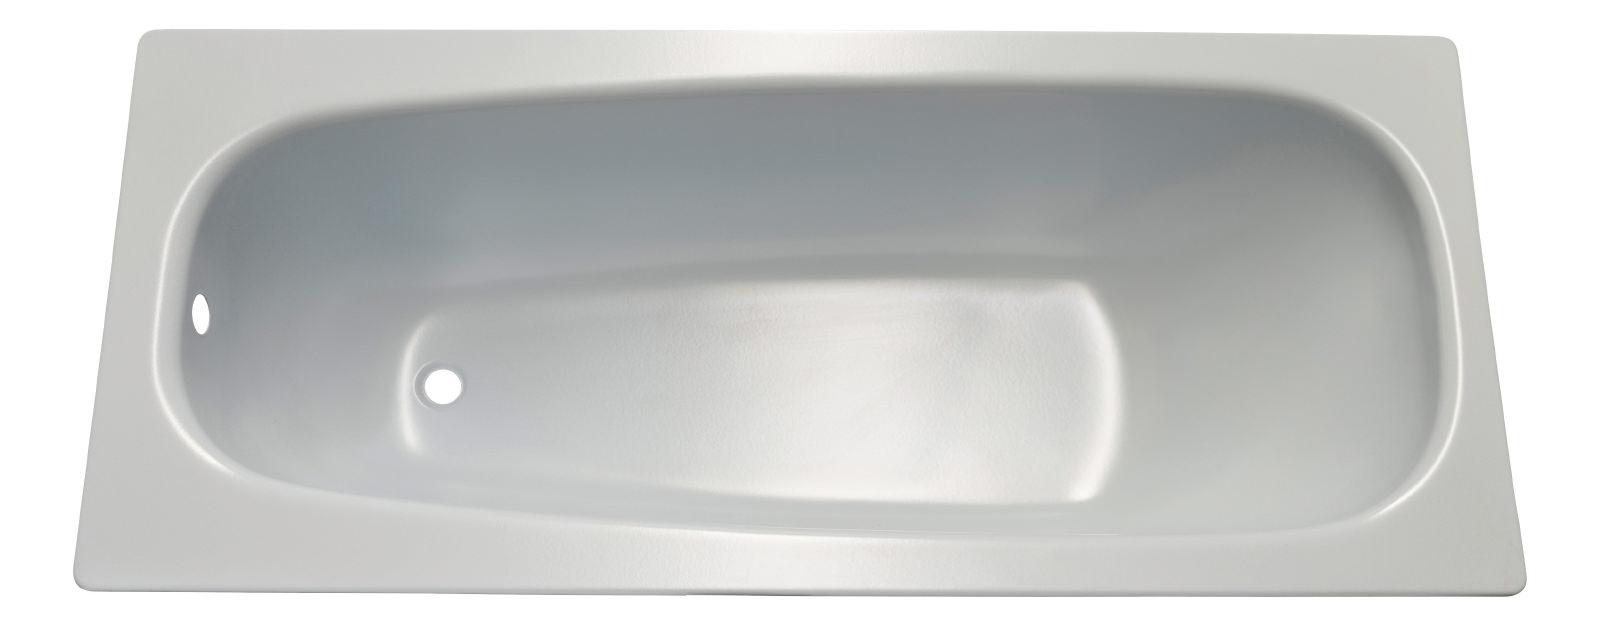 Full Size of Badewanne Bette Betteform One 3313 Wanne Lux Select 180x80 Starlet V Loft 180 X 80 Stahl Krperform Japanische Betten Günstige 180x200 140x200 Ikea 160x200 Mit Bett Badewanne Bette